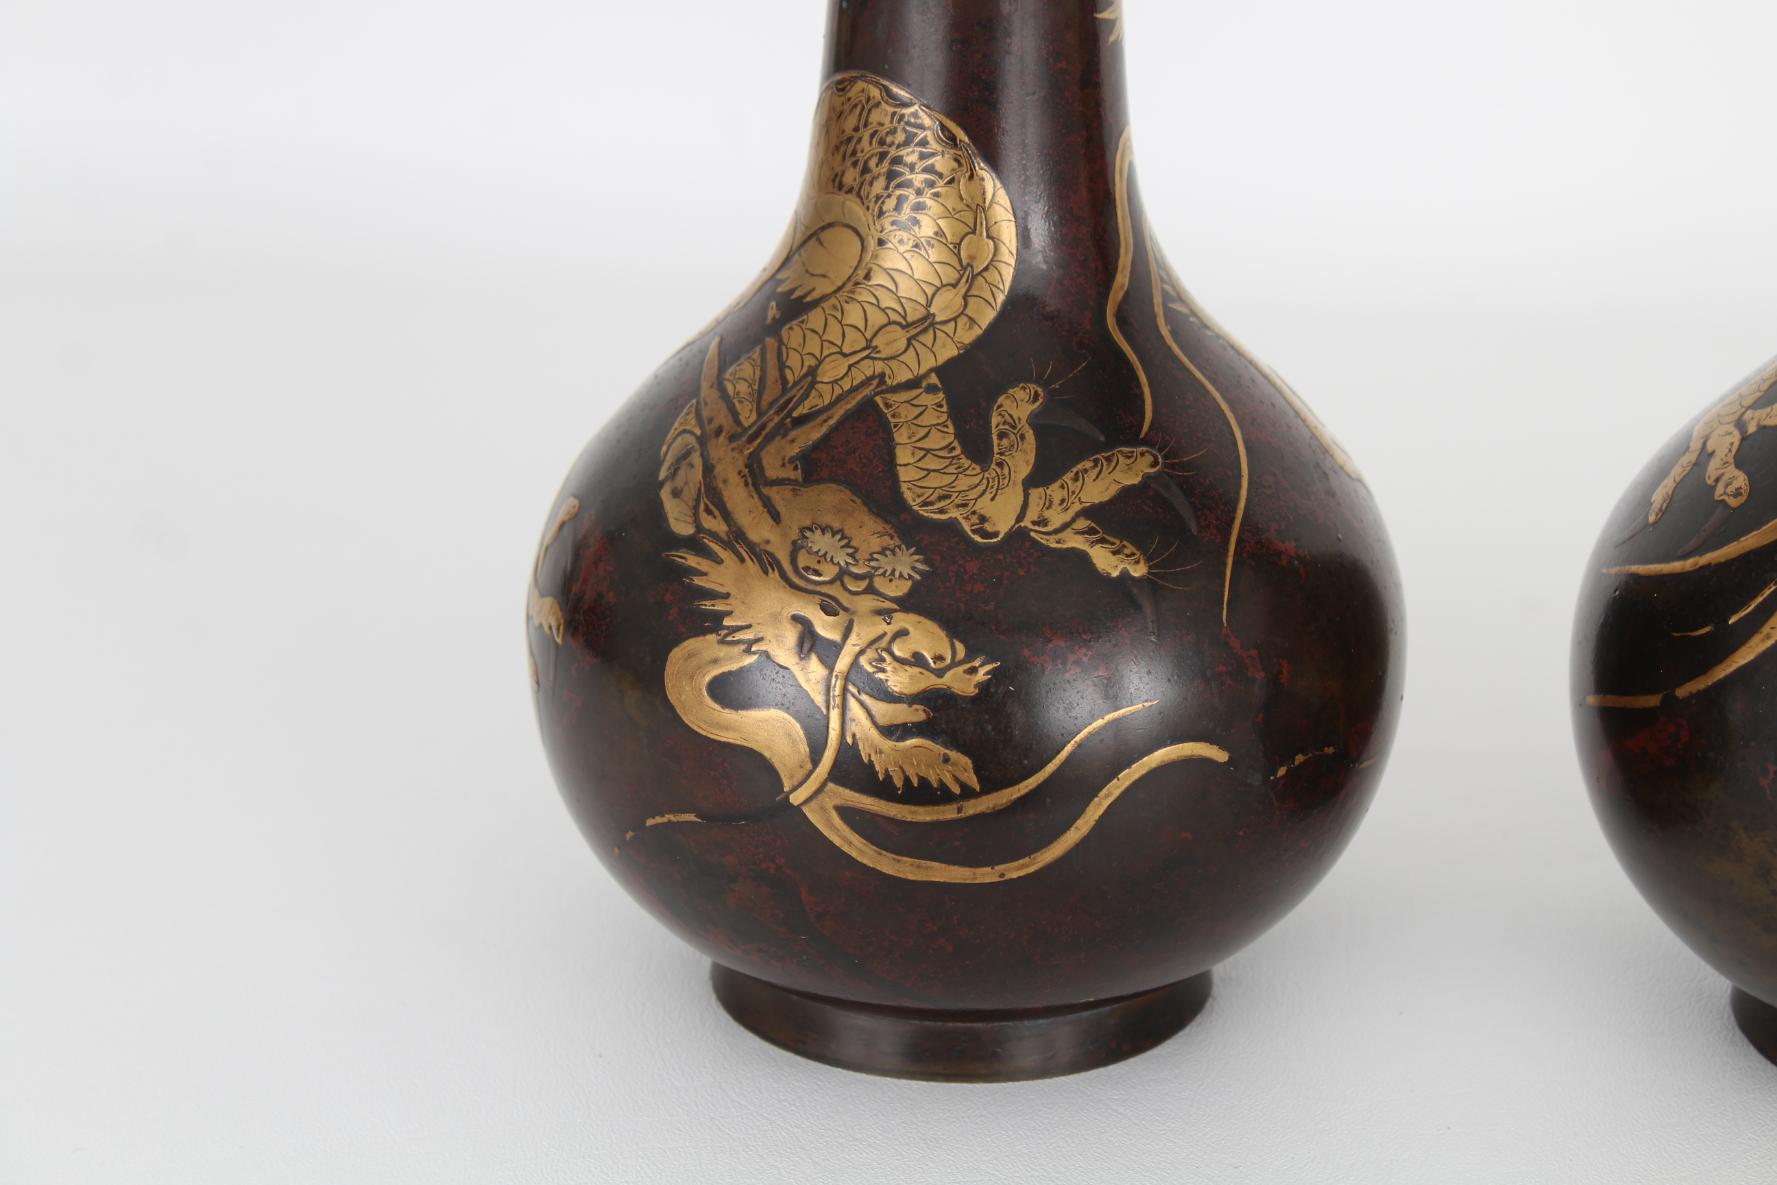 (2) Antique Bronze/Gold Japanese Dragon Vases - Image 2 of 7